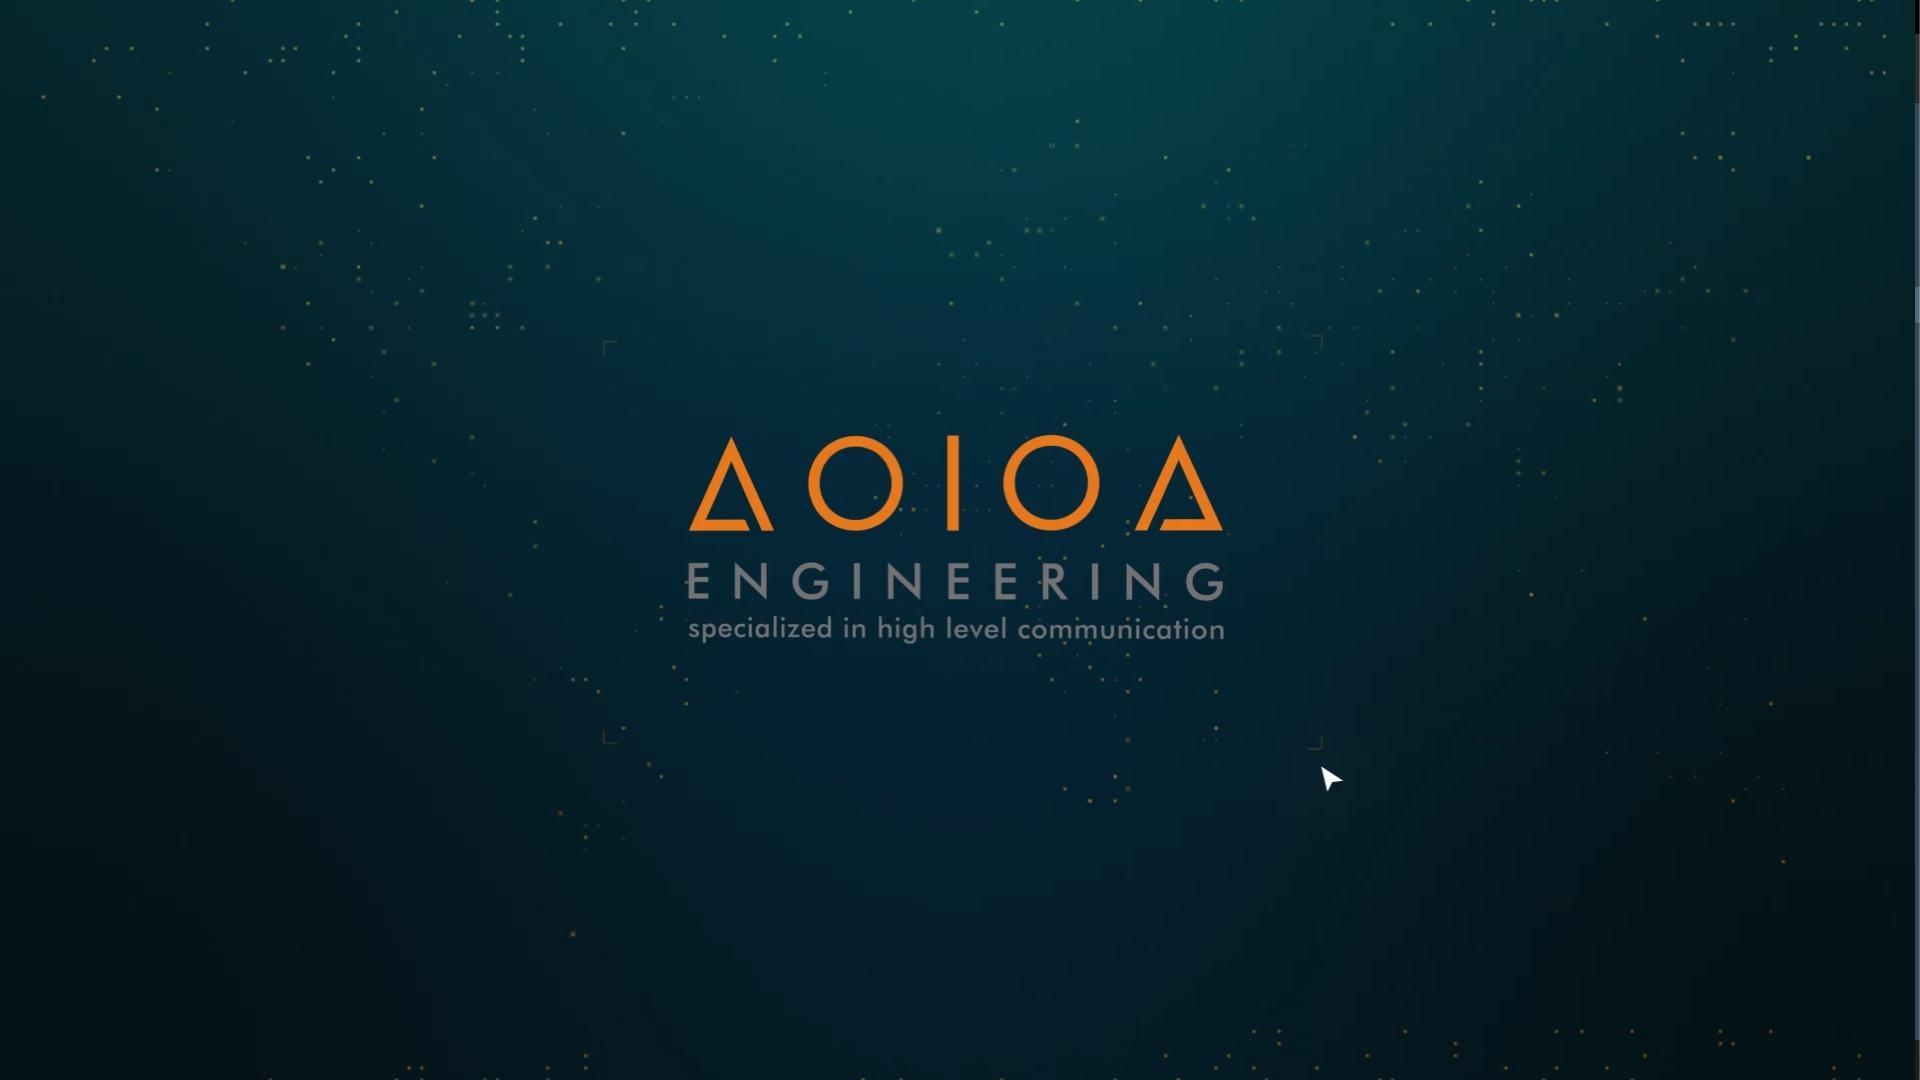 http://aoloa.de/sites/default/files/revslider/image/aoloa_cover.jpg